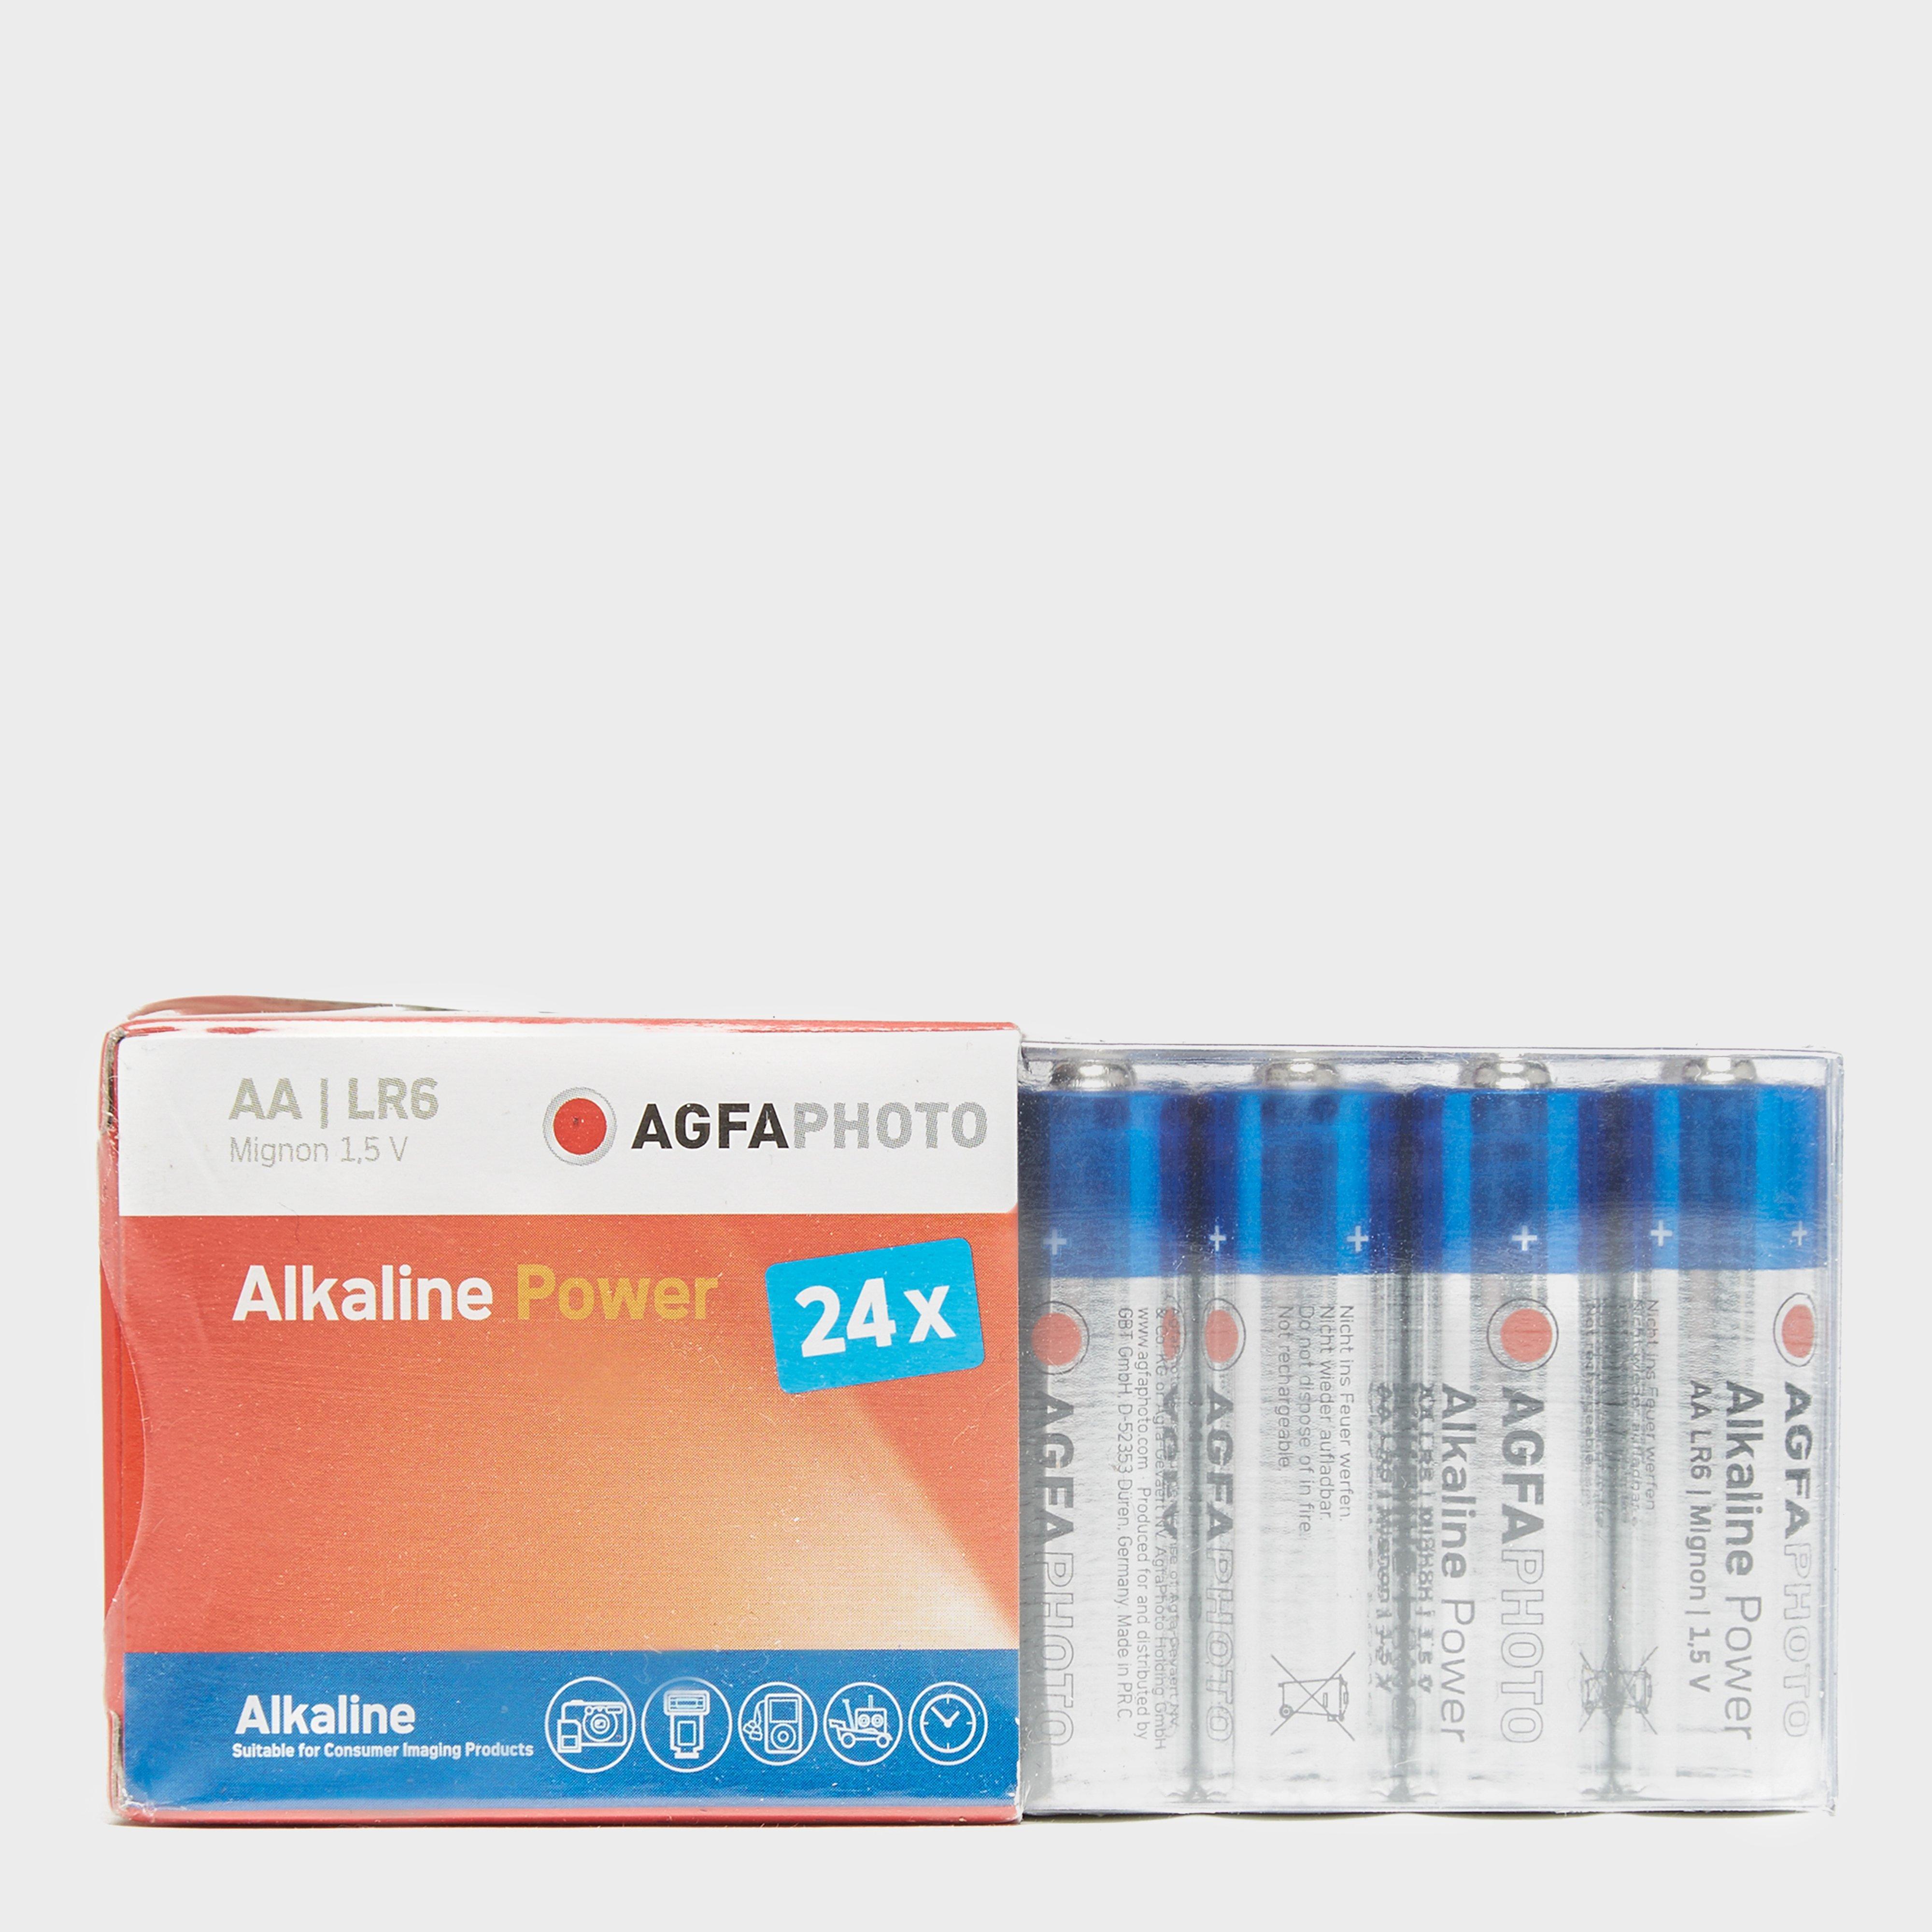 AGFA Alkaline Power AA Batteries 24 Pack, Multi